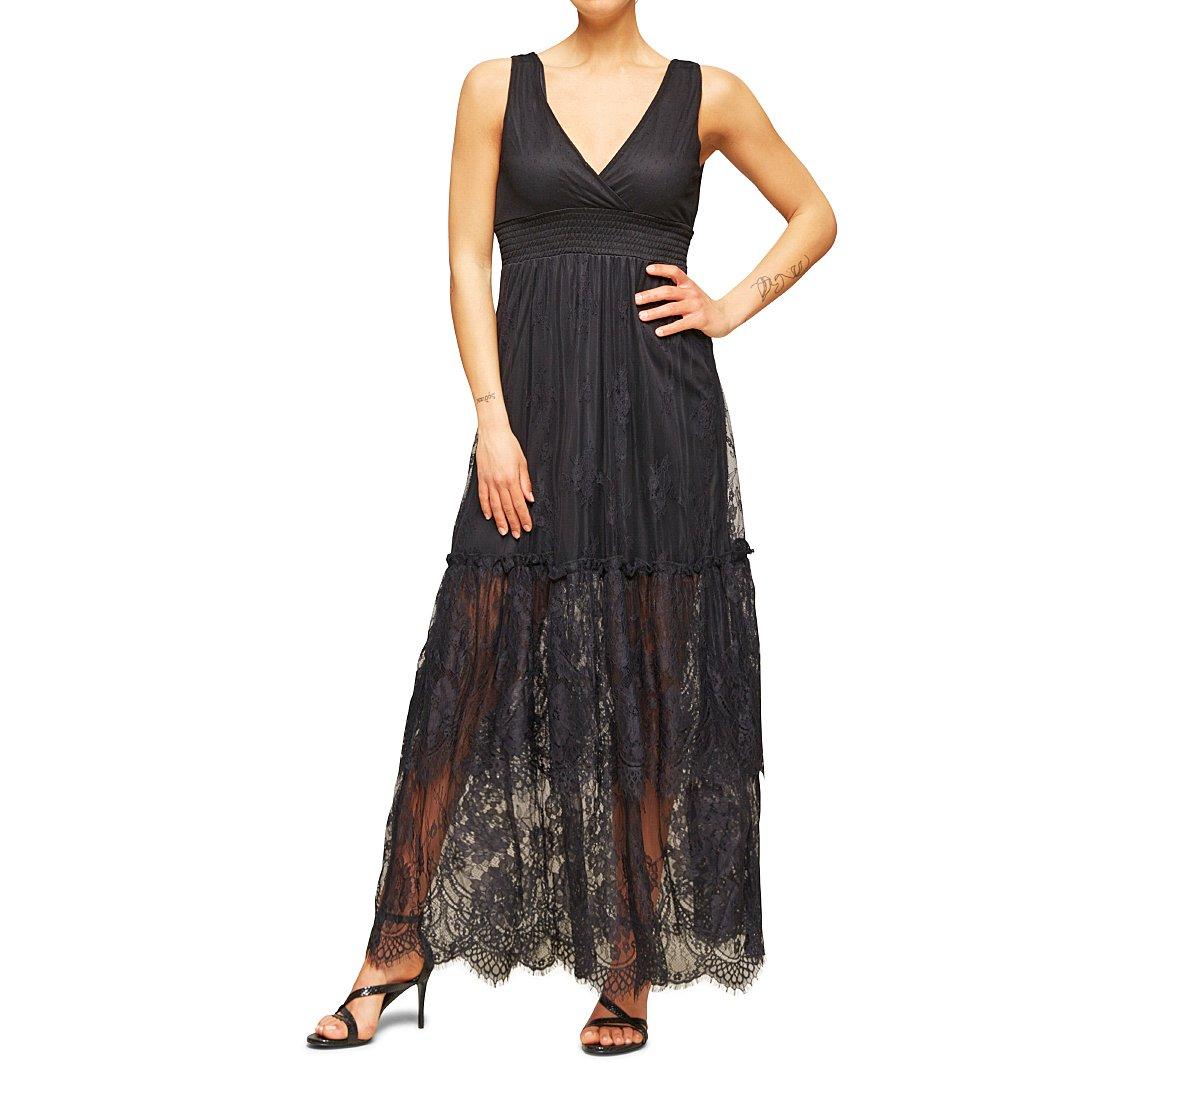 Sleeveless dress with V-neck